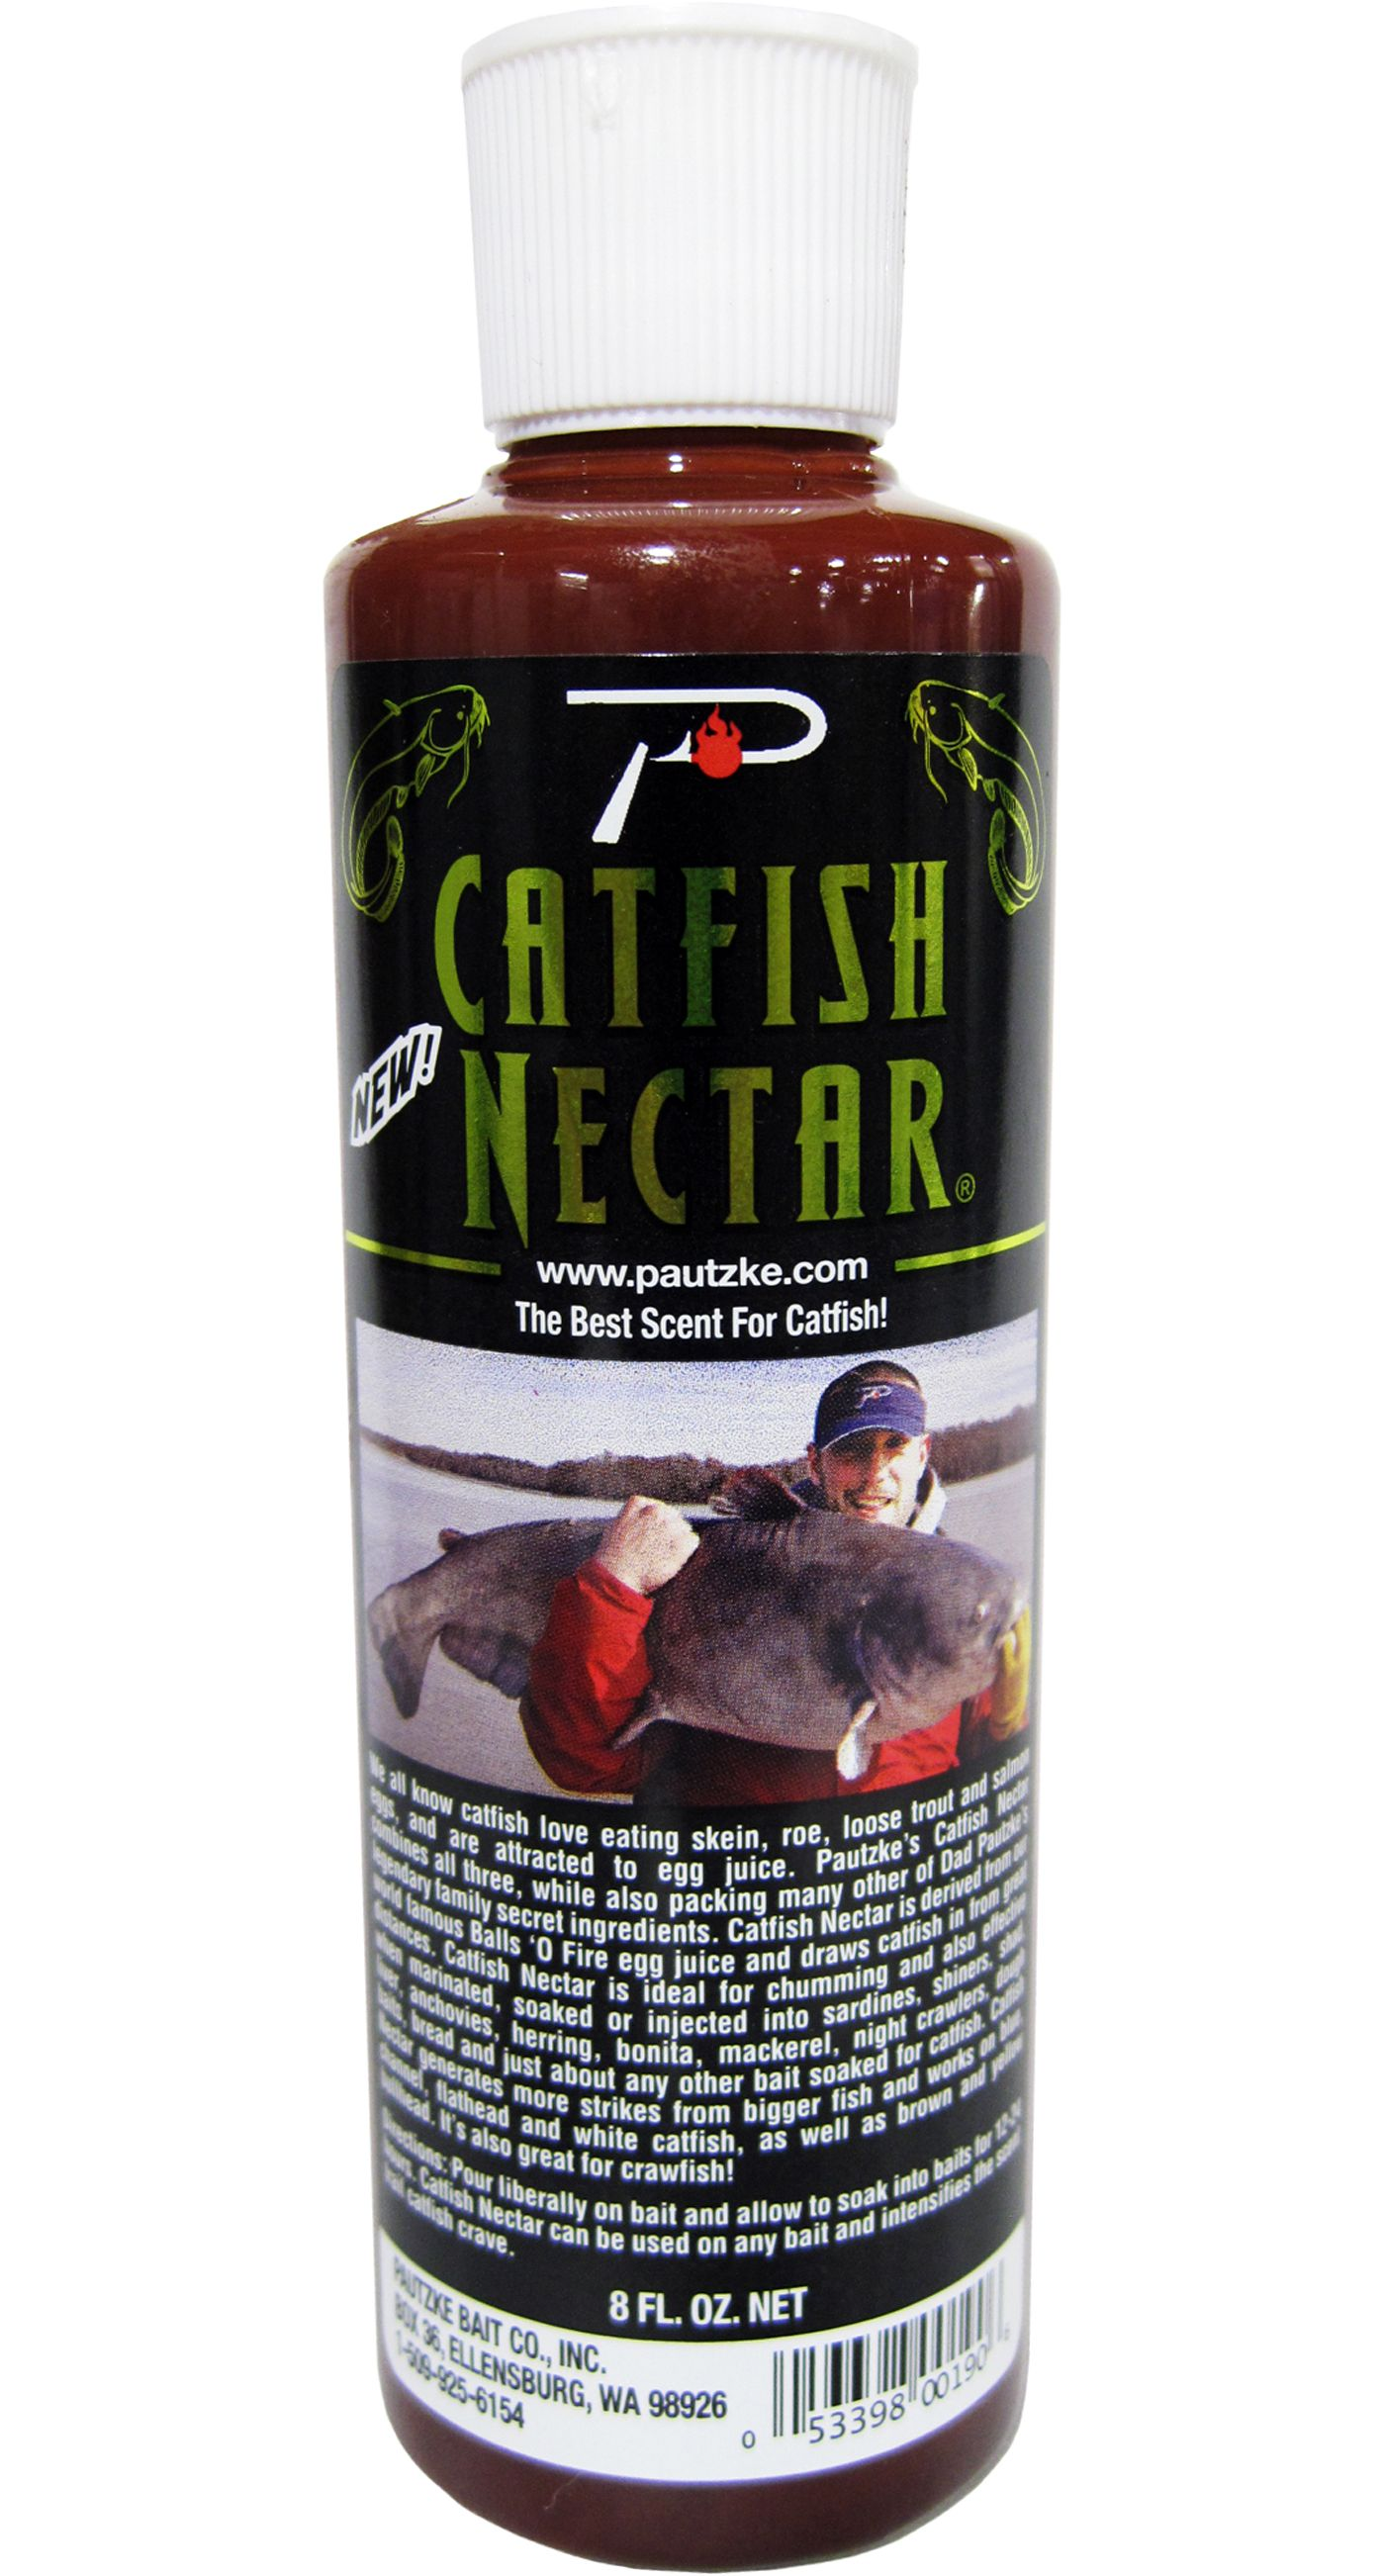 Pautzke Catfish Nectar Fish Attractant